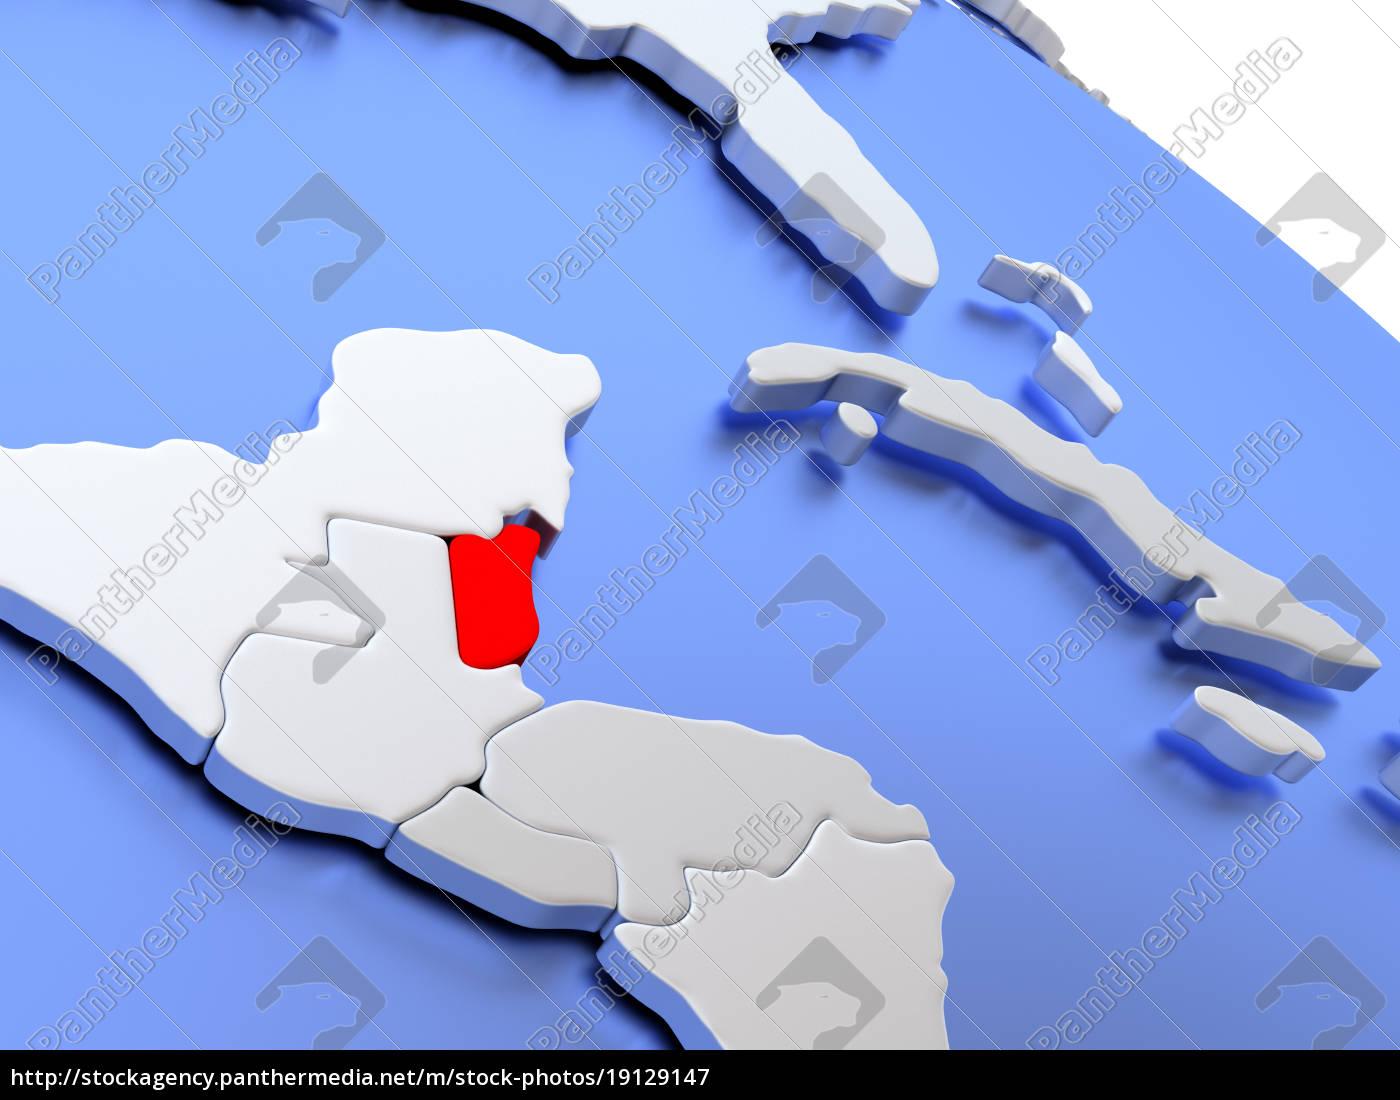 belize, on, world, map - 19129147